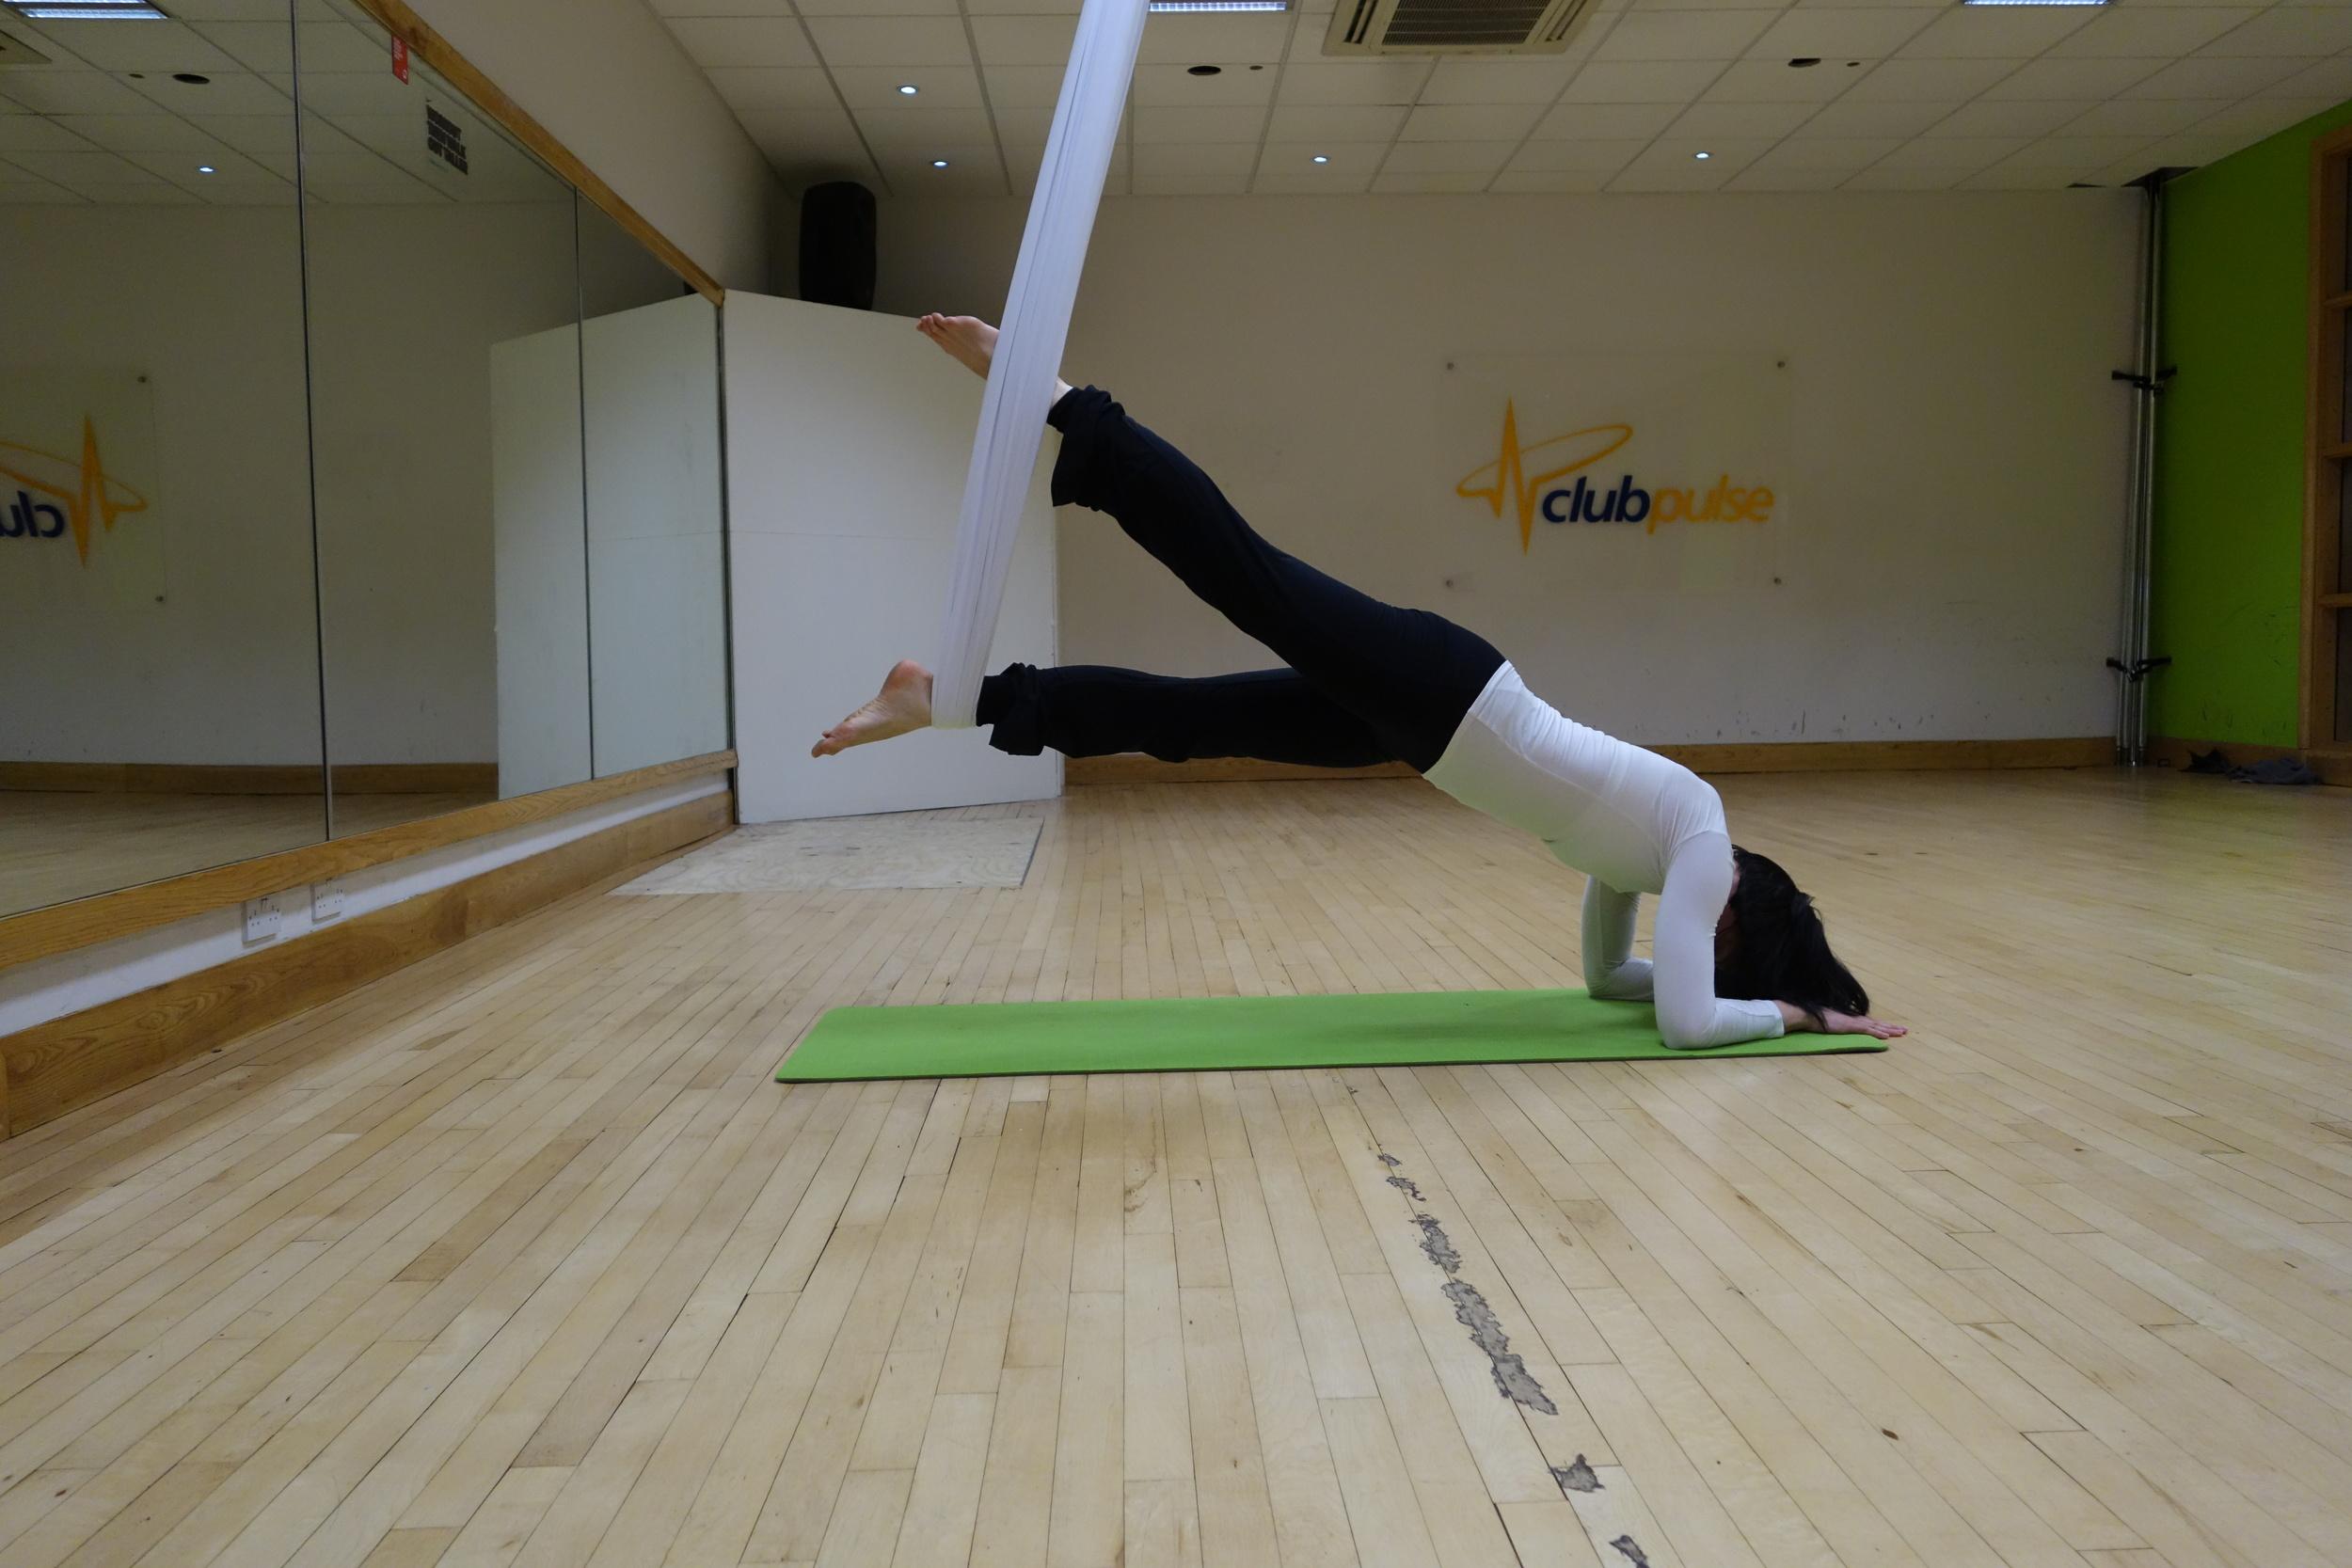 plank_forarm_leg.JPG